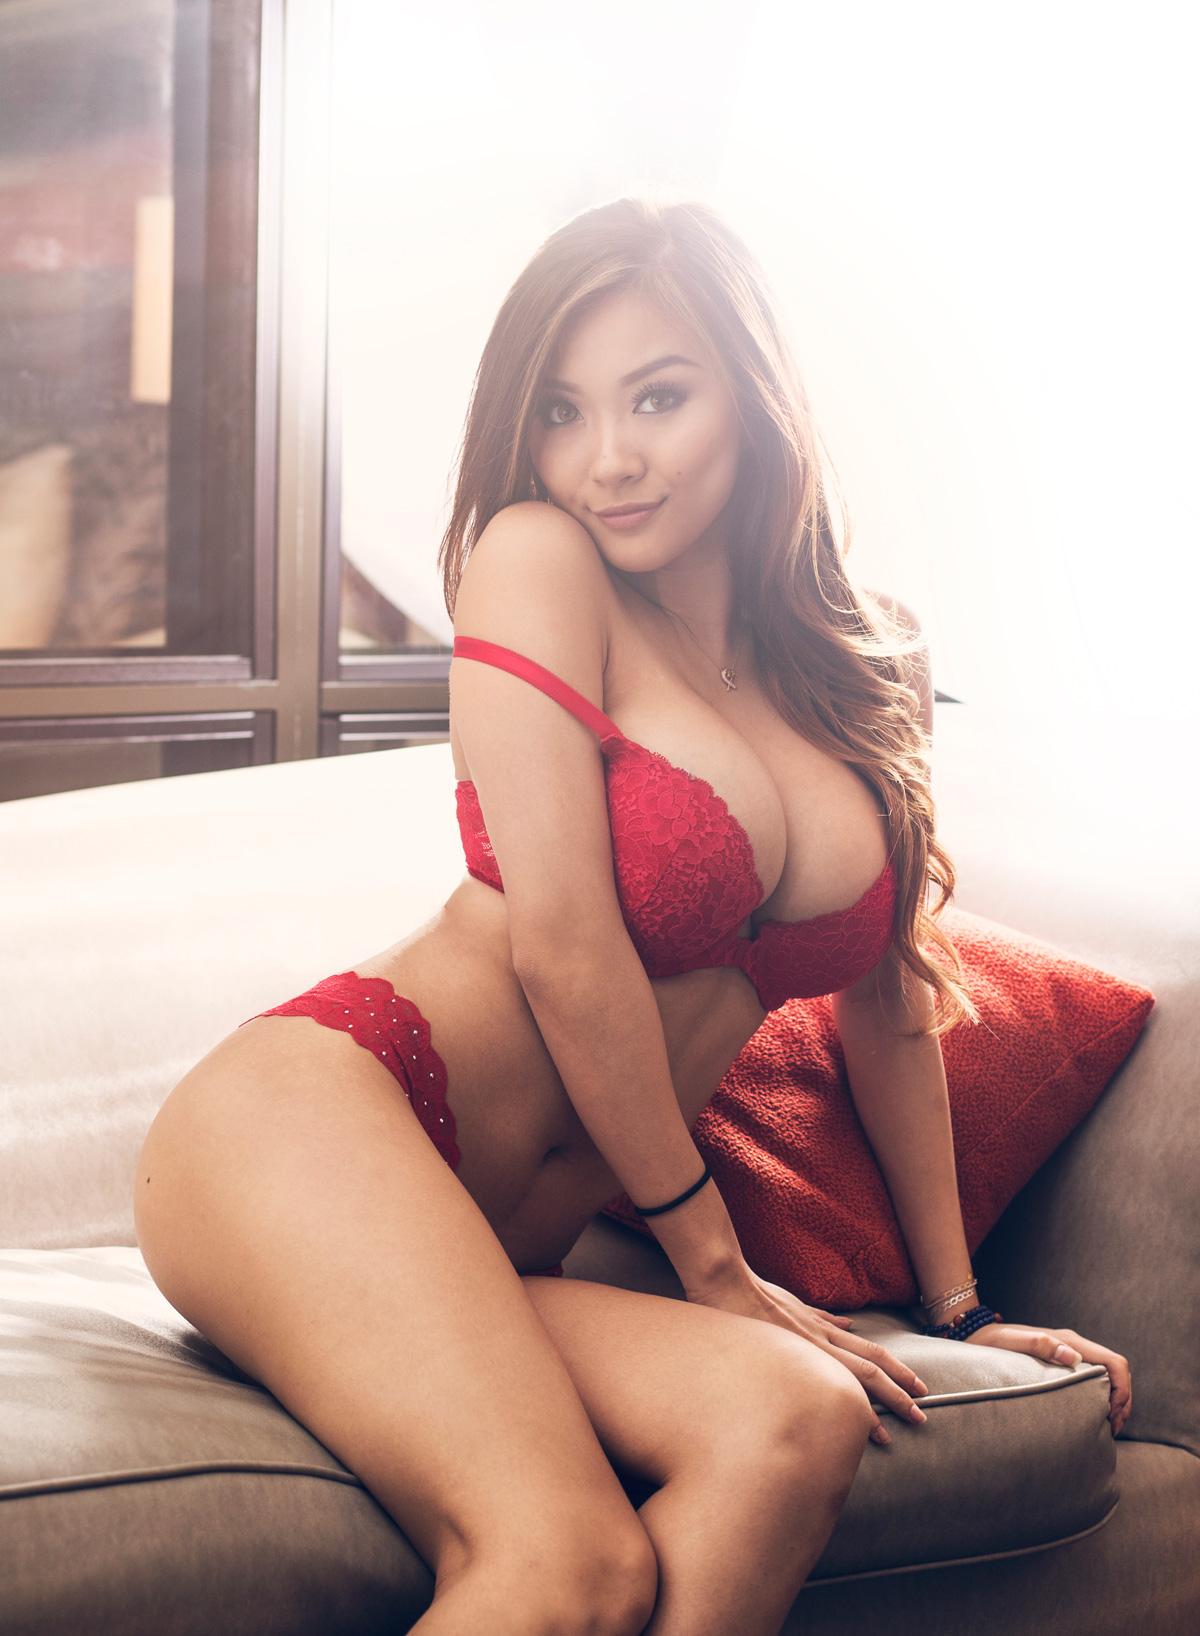 Vk nude babe photo albums hentia gallery